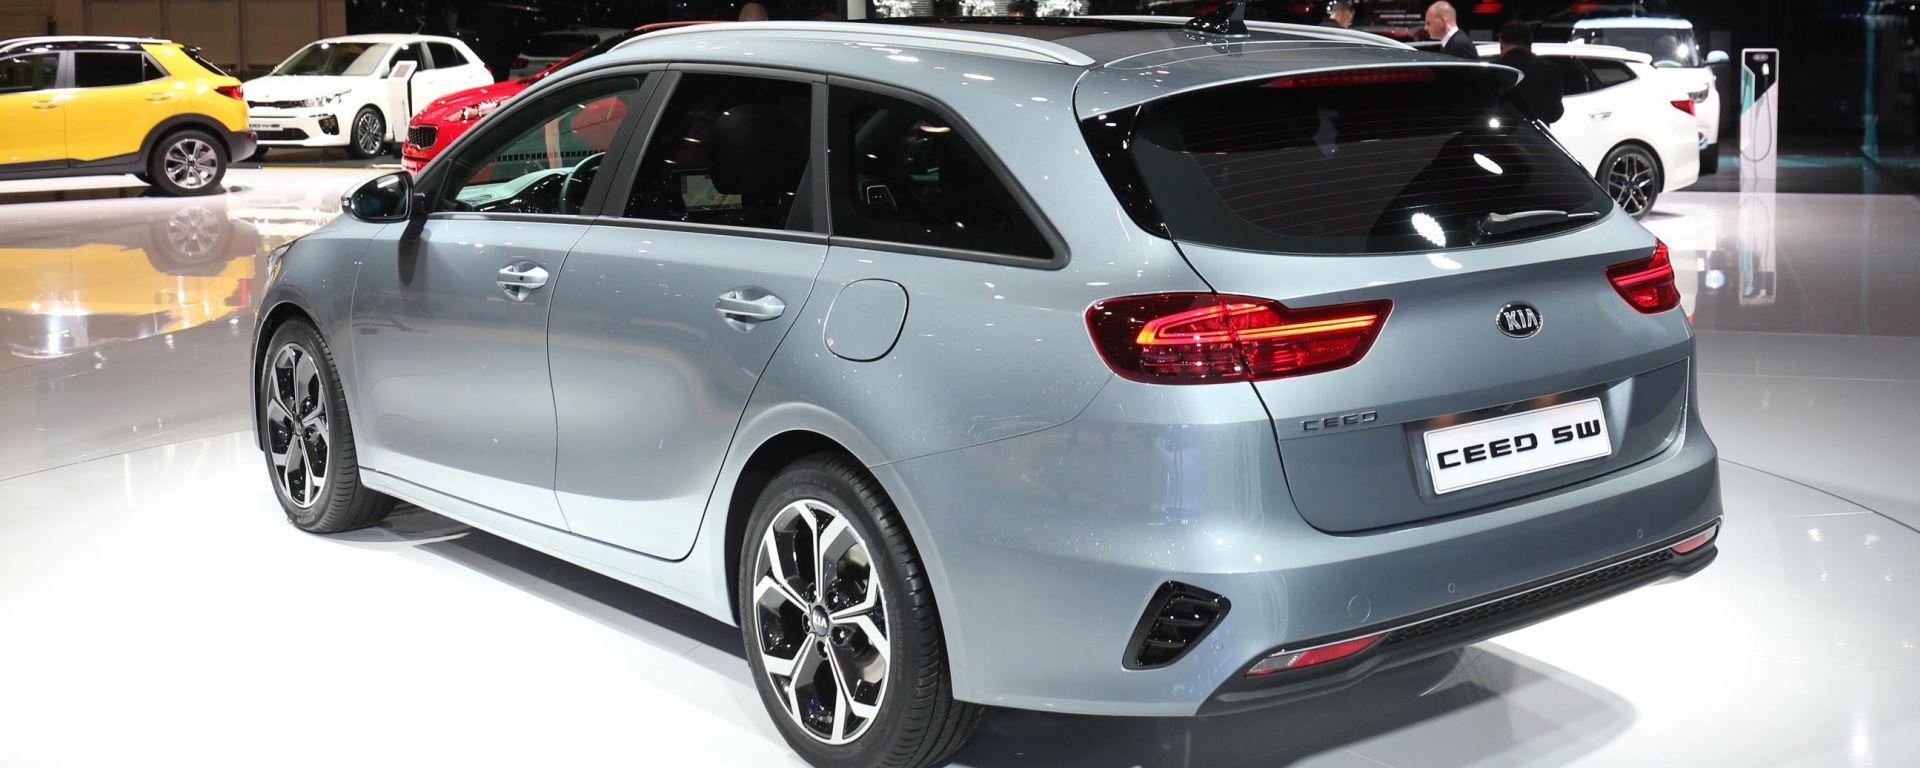 Nuova Kia Ceed 2018: in video dal Salone di Ginevra 2018